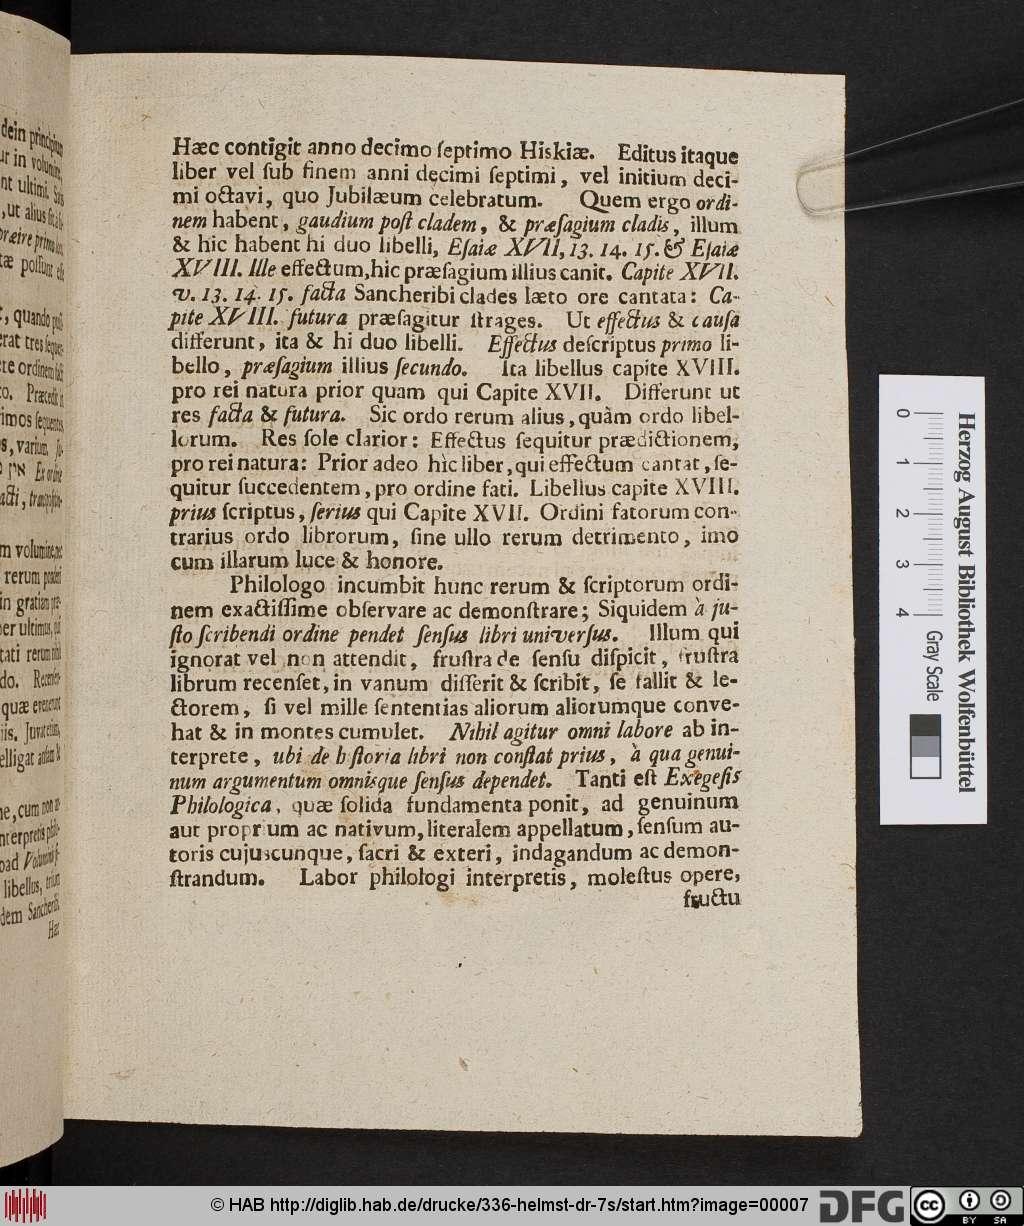 http://diglib.hab.de/drucke/336-helmst-dr-7s/00007.jpg